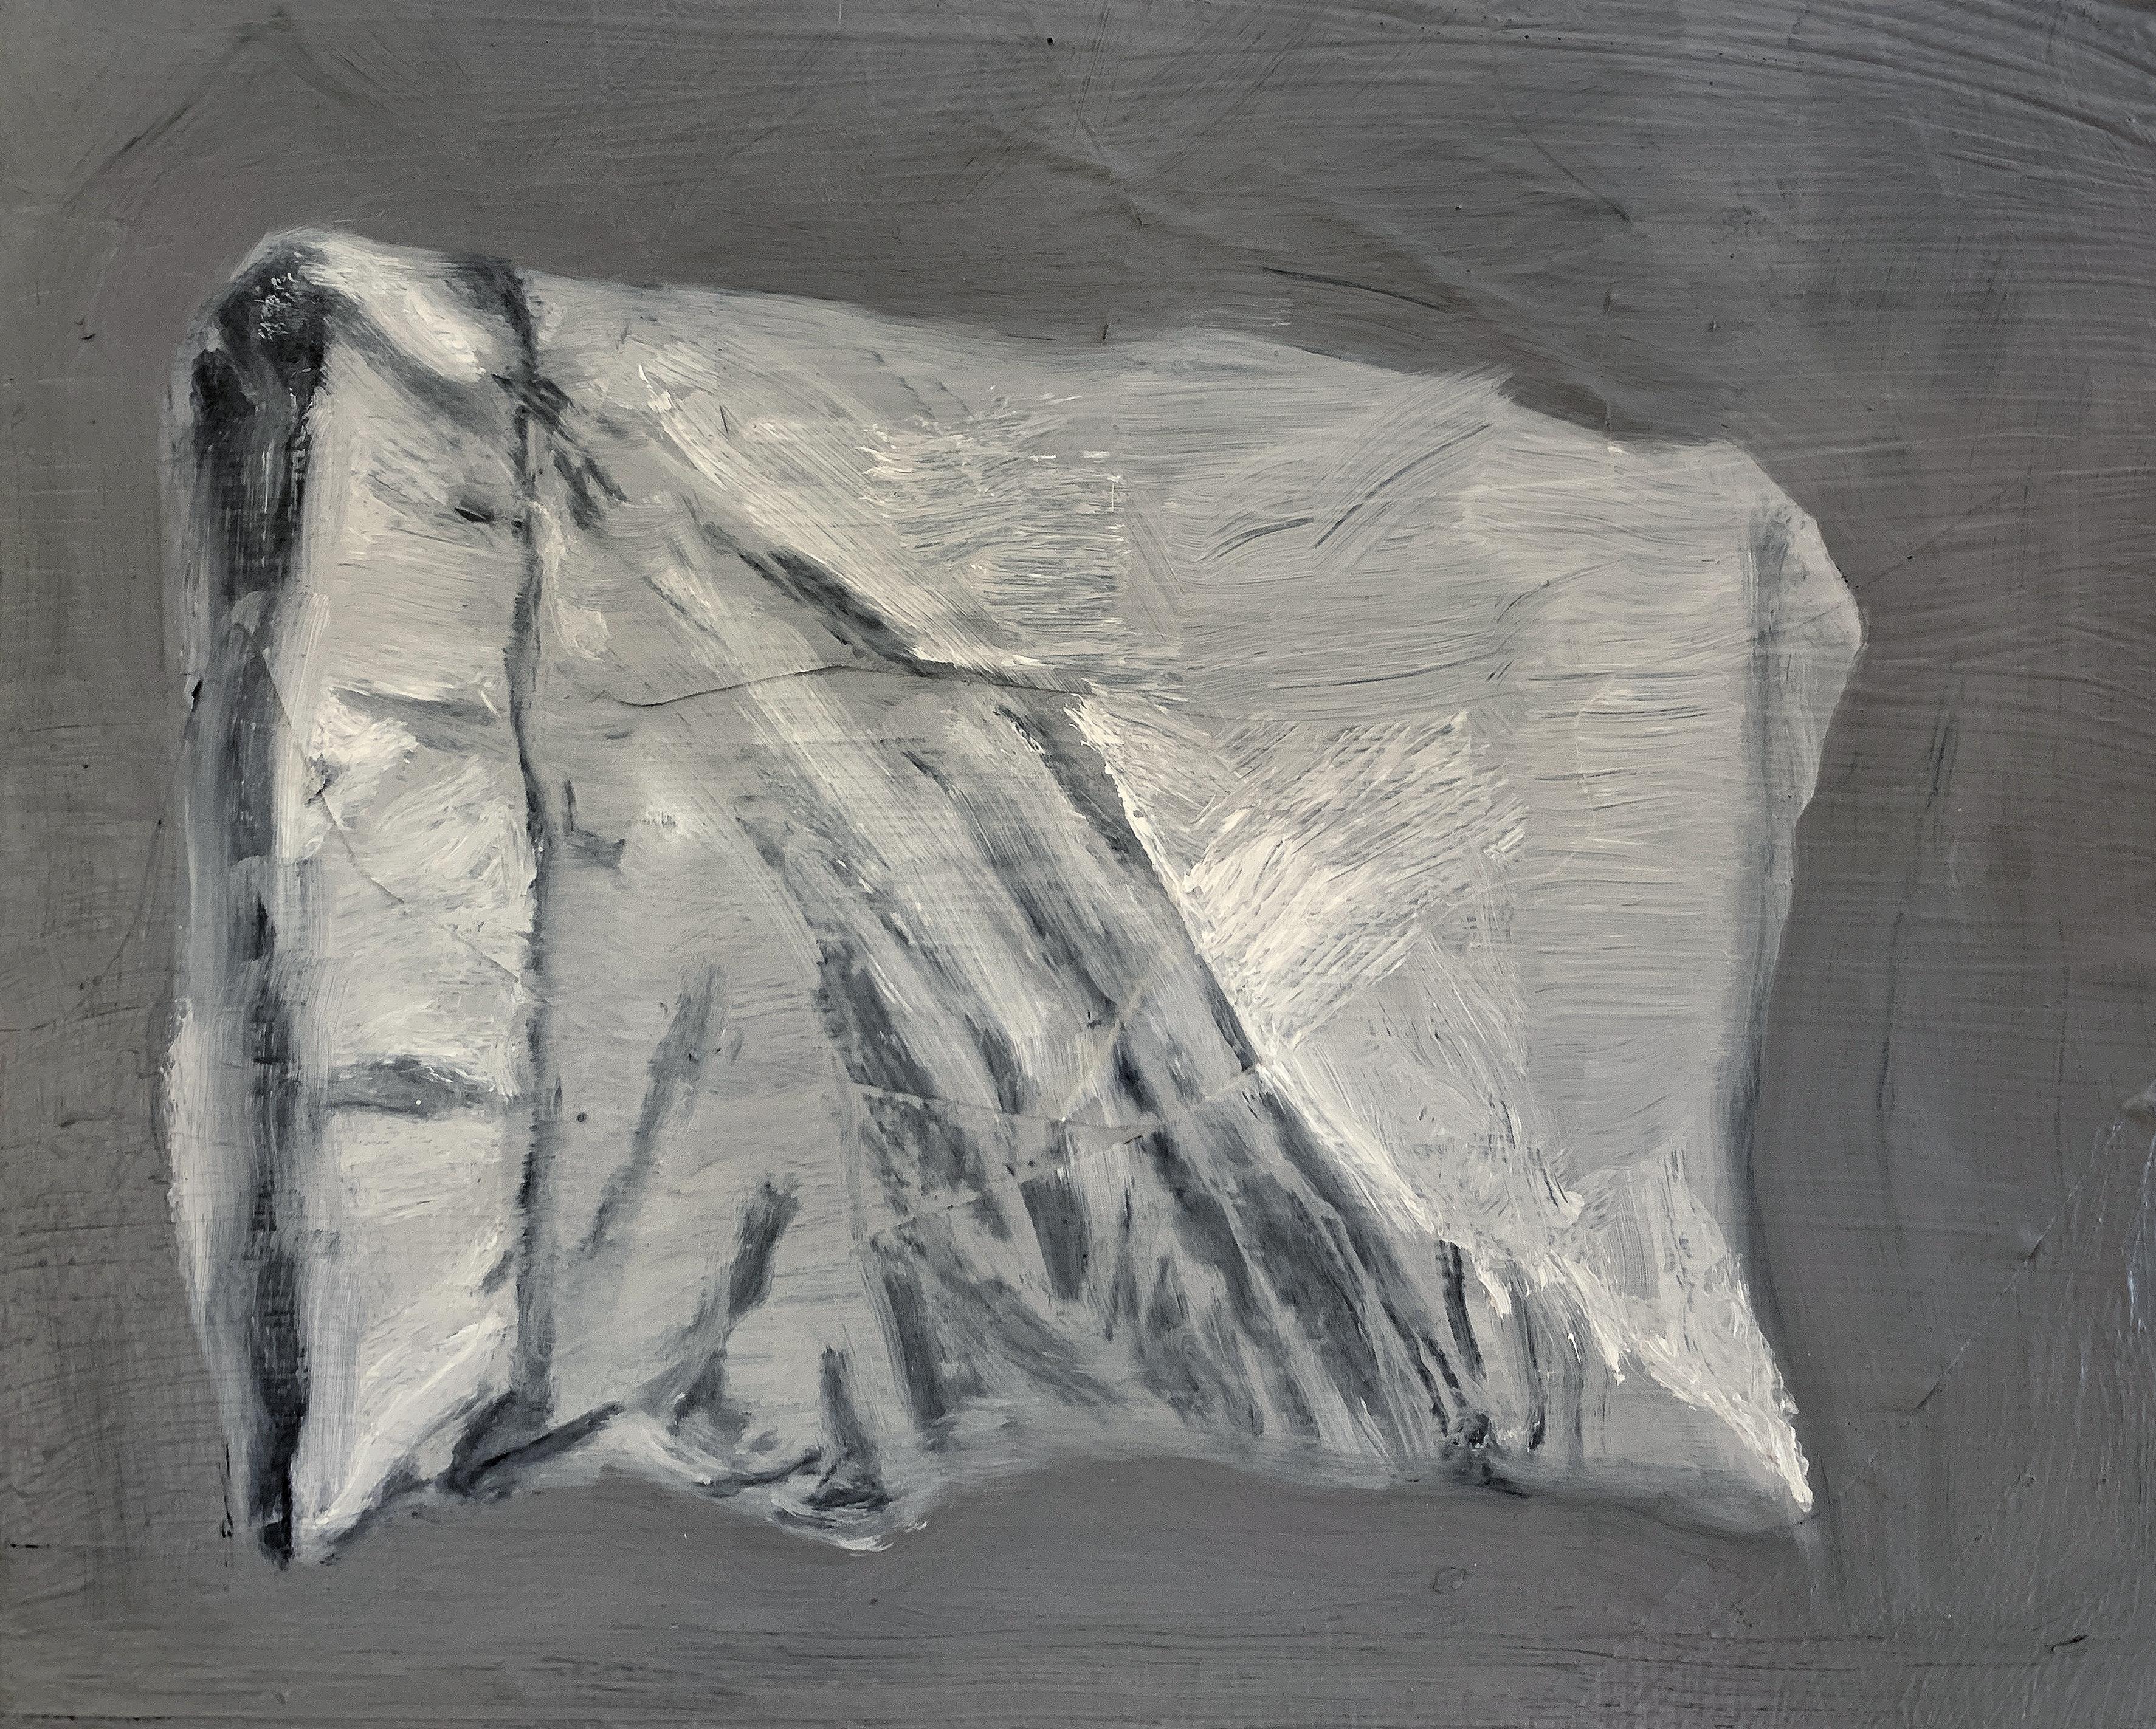 Pillow Palimpsest III